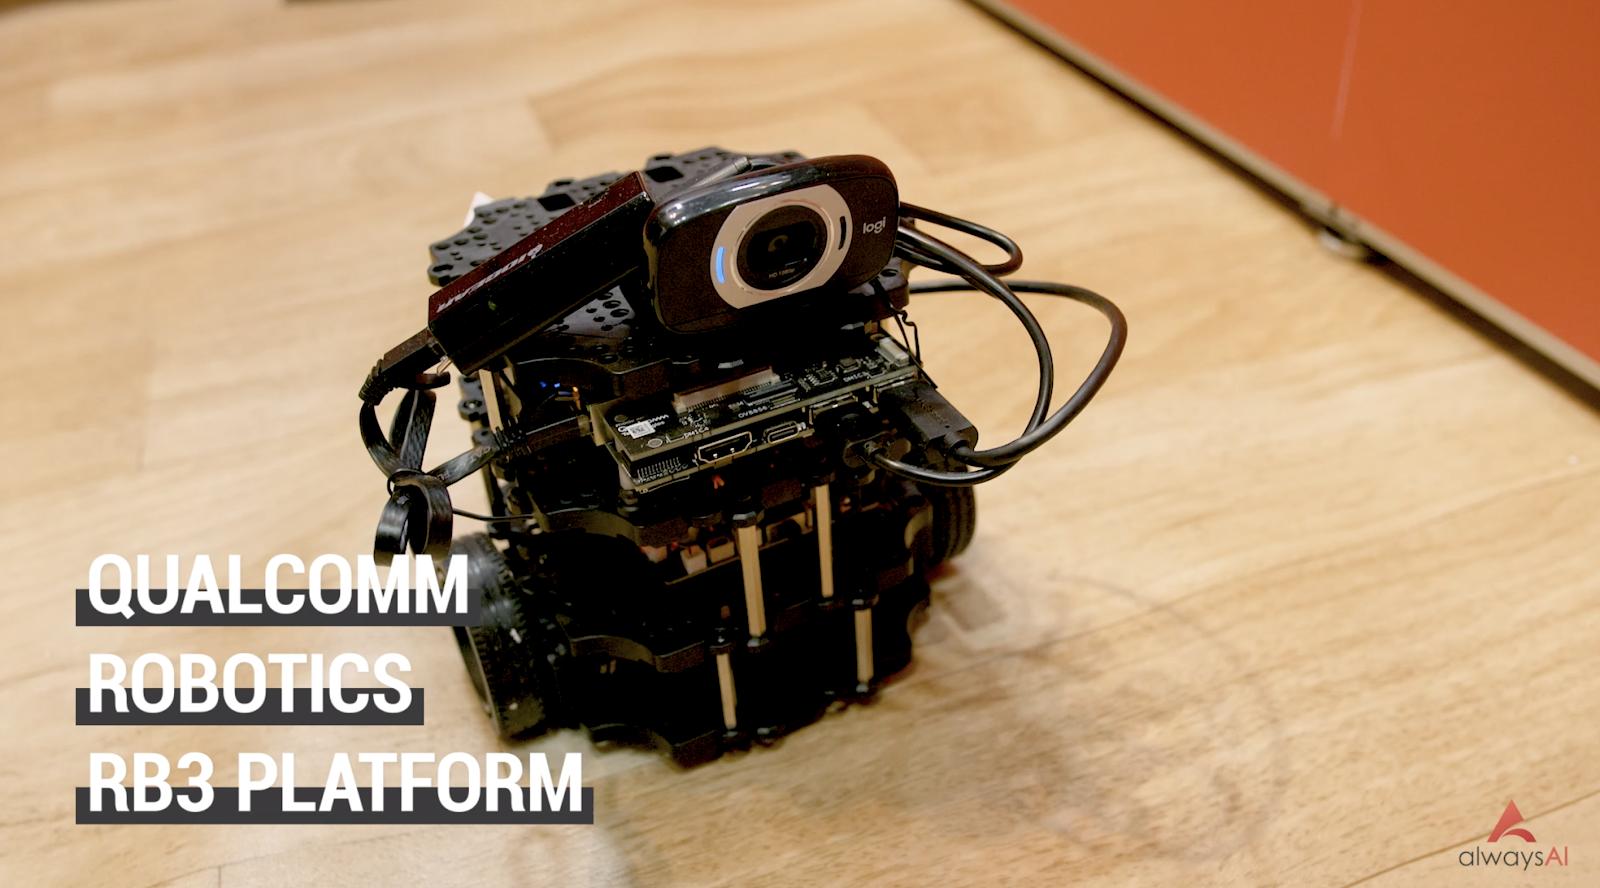 Qualcomm Robotics RB3 Platform turtle bot